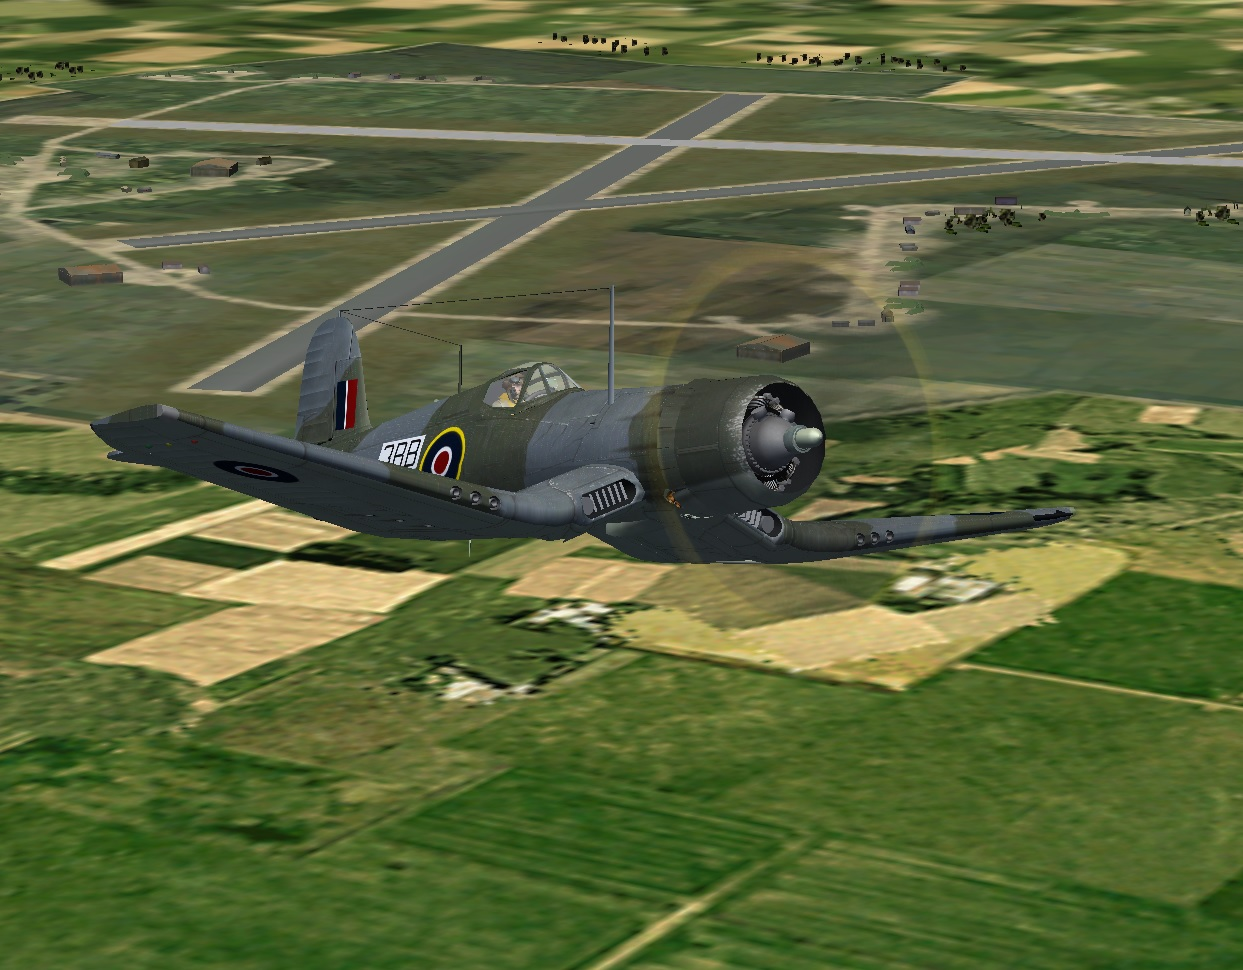 Corsair MkII Takeoff 2